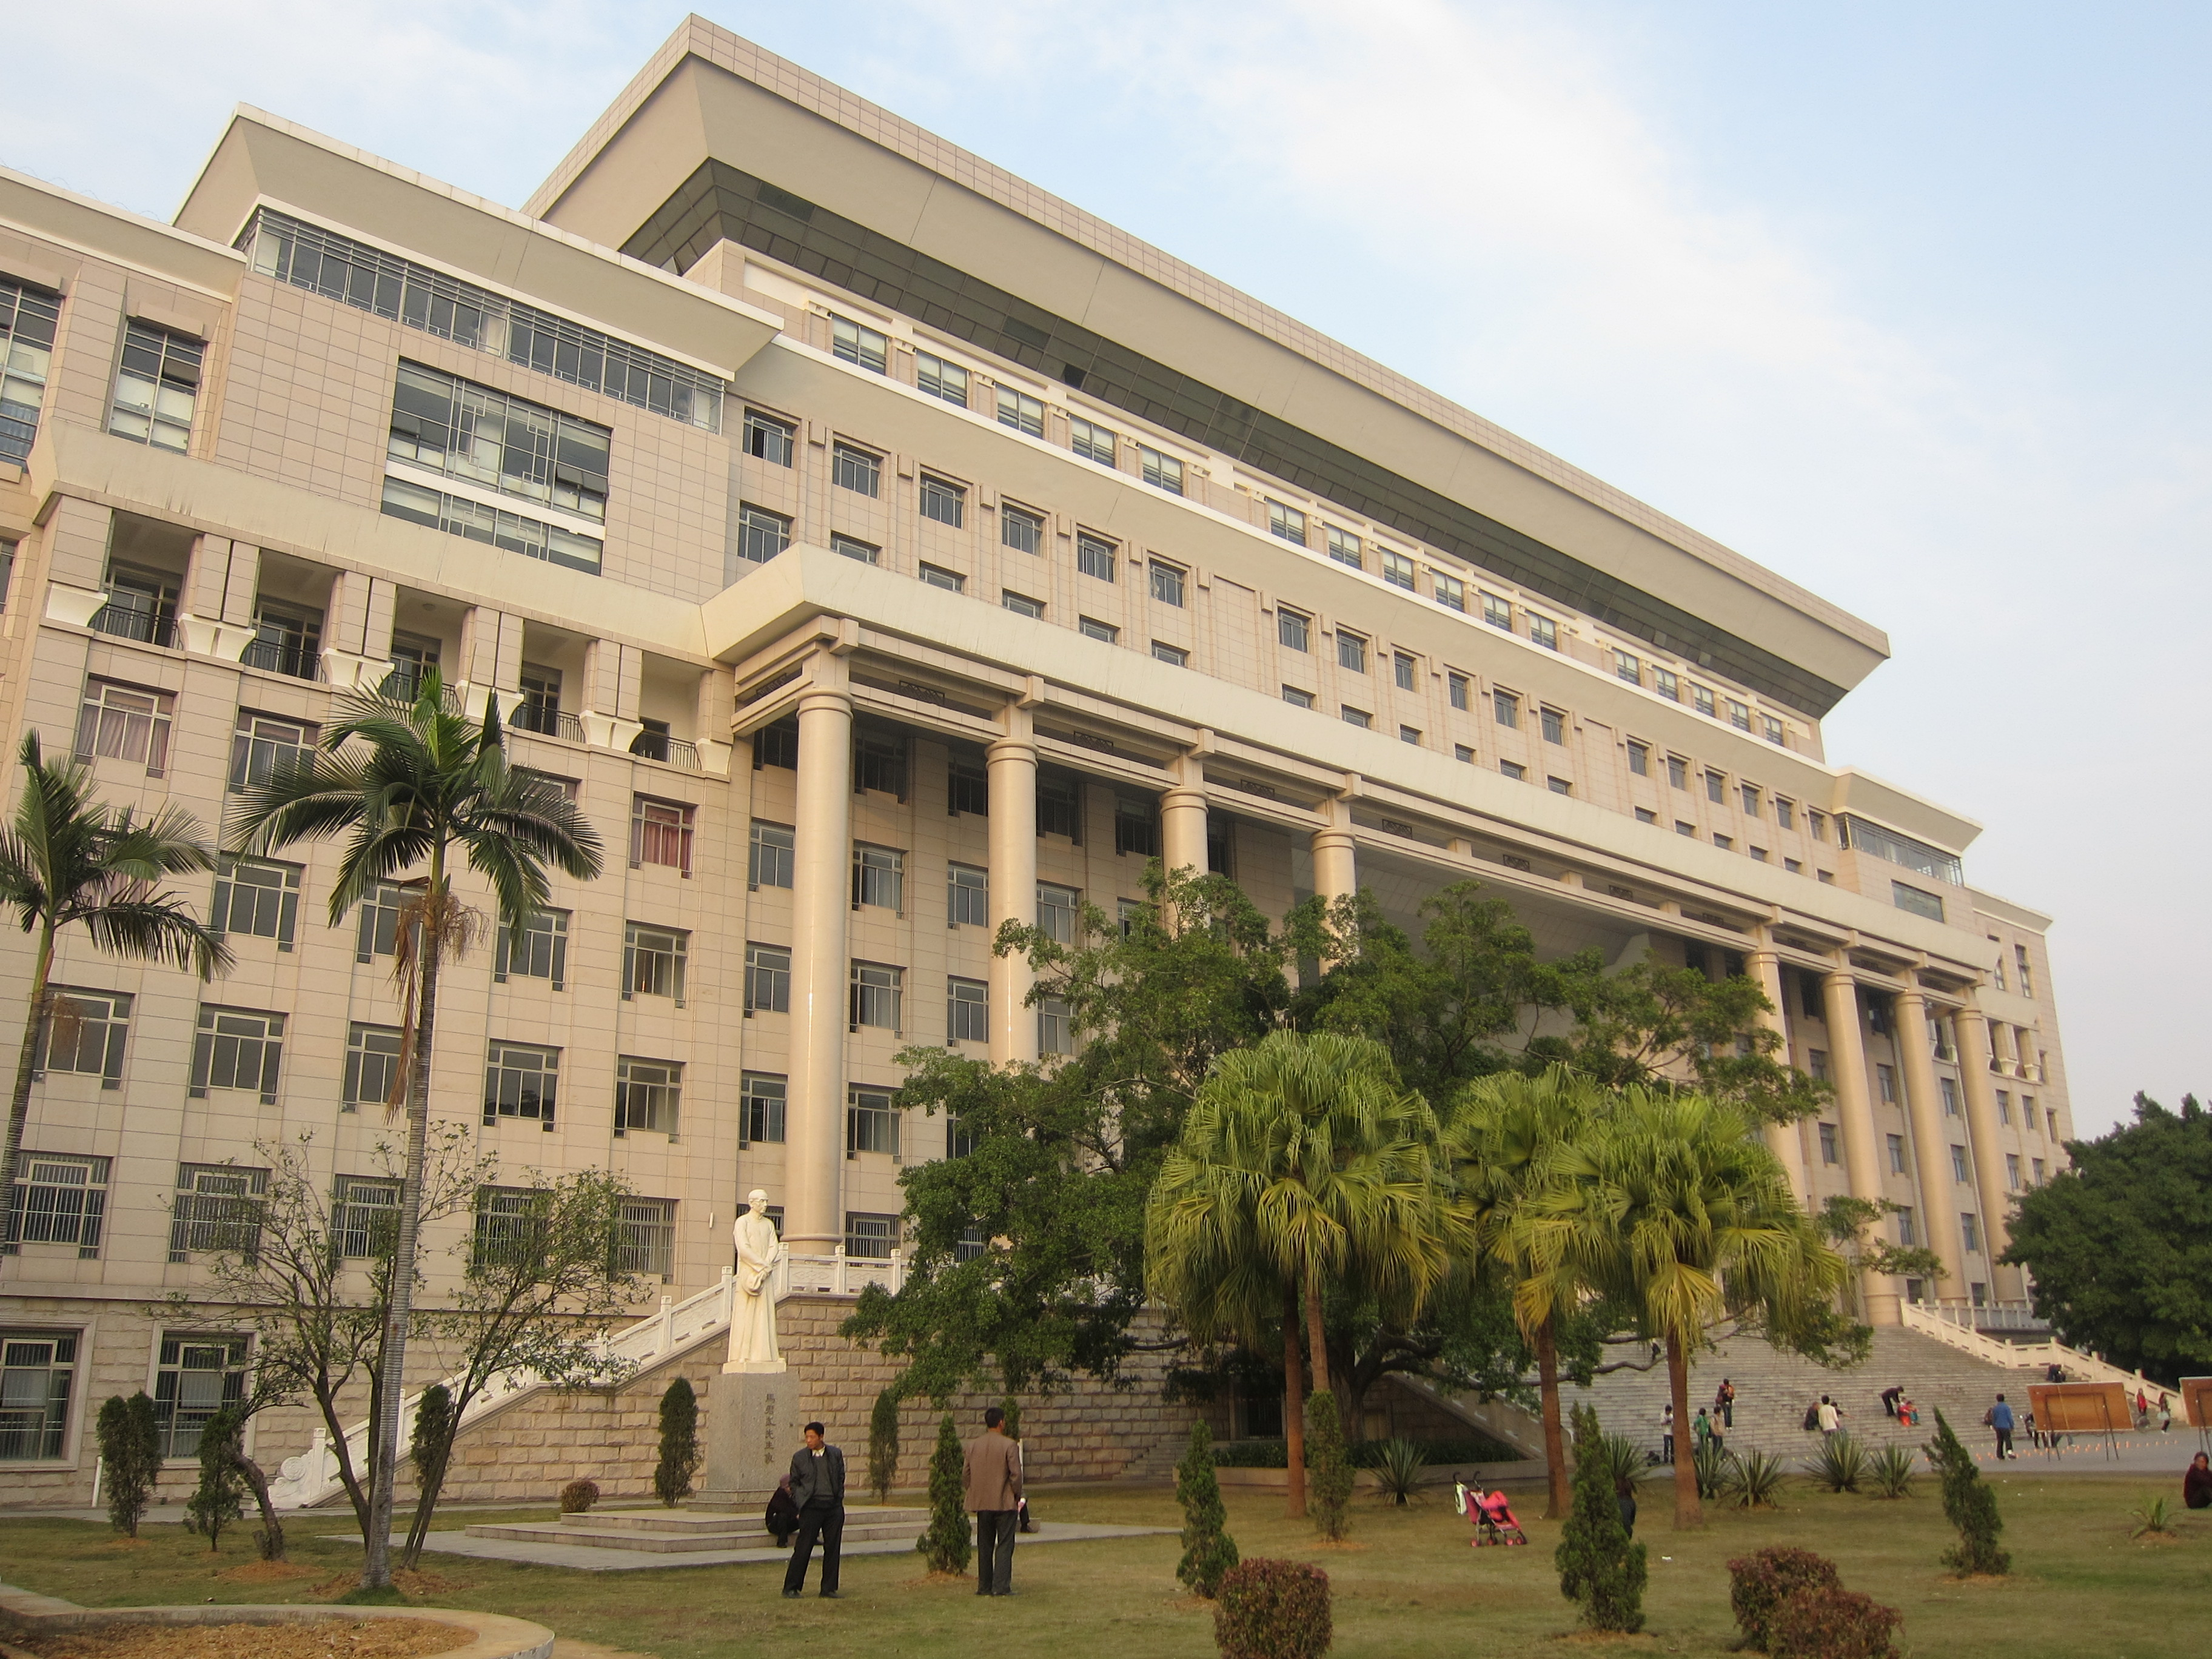 1%2f1f%2fguangxi university